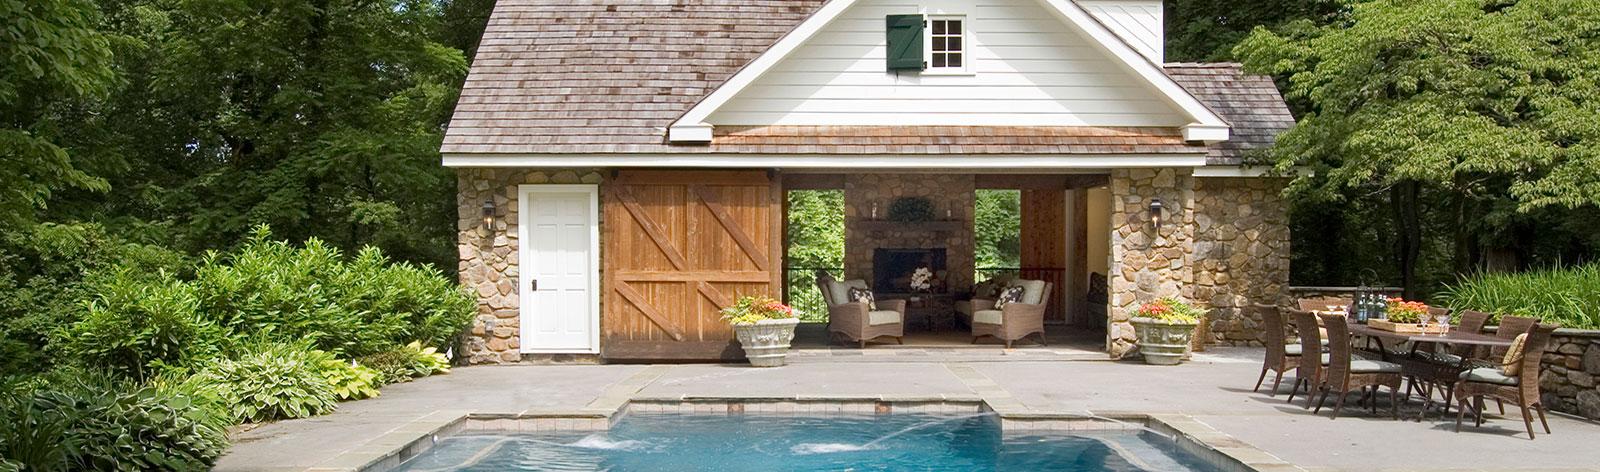 Long island masonry design landscape architecture company for Custom pool house